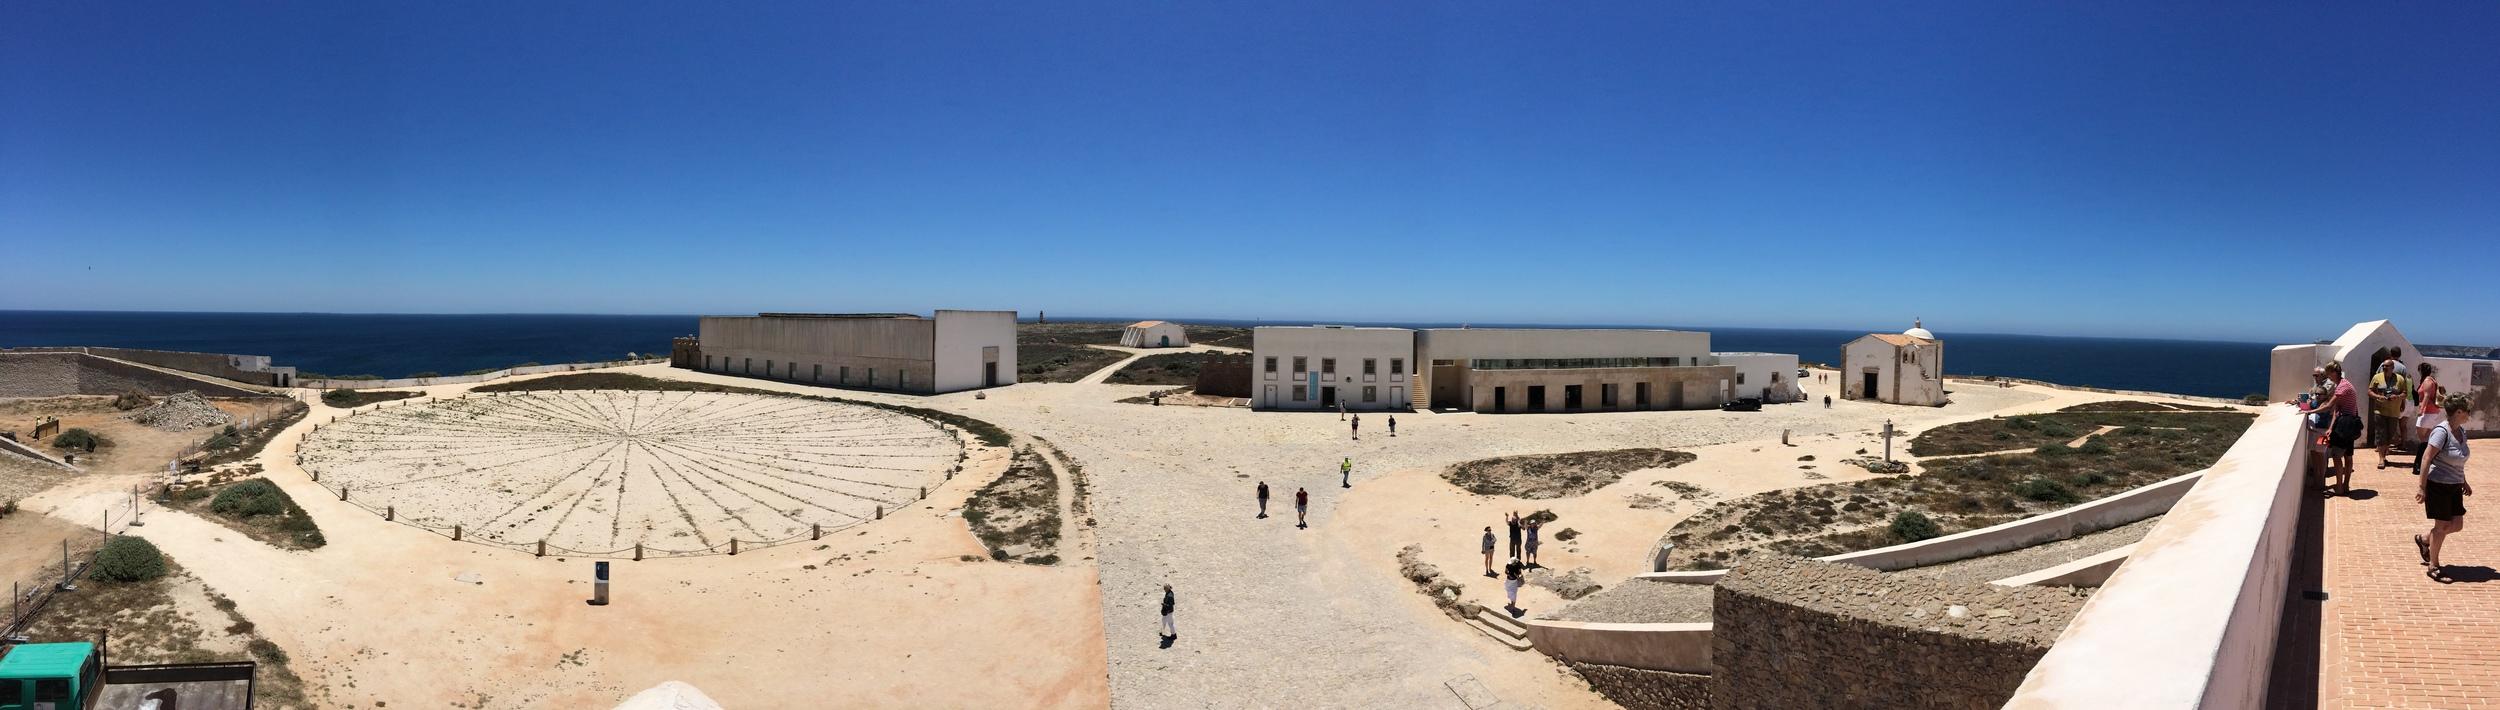 View of Ponta de Sagres from the top of the Fortaleza de Sagres.